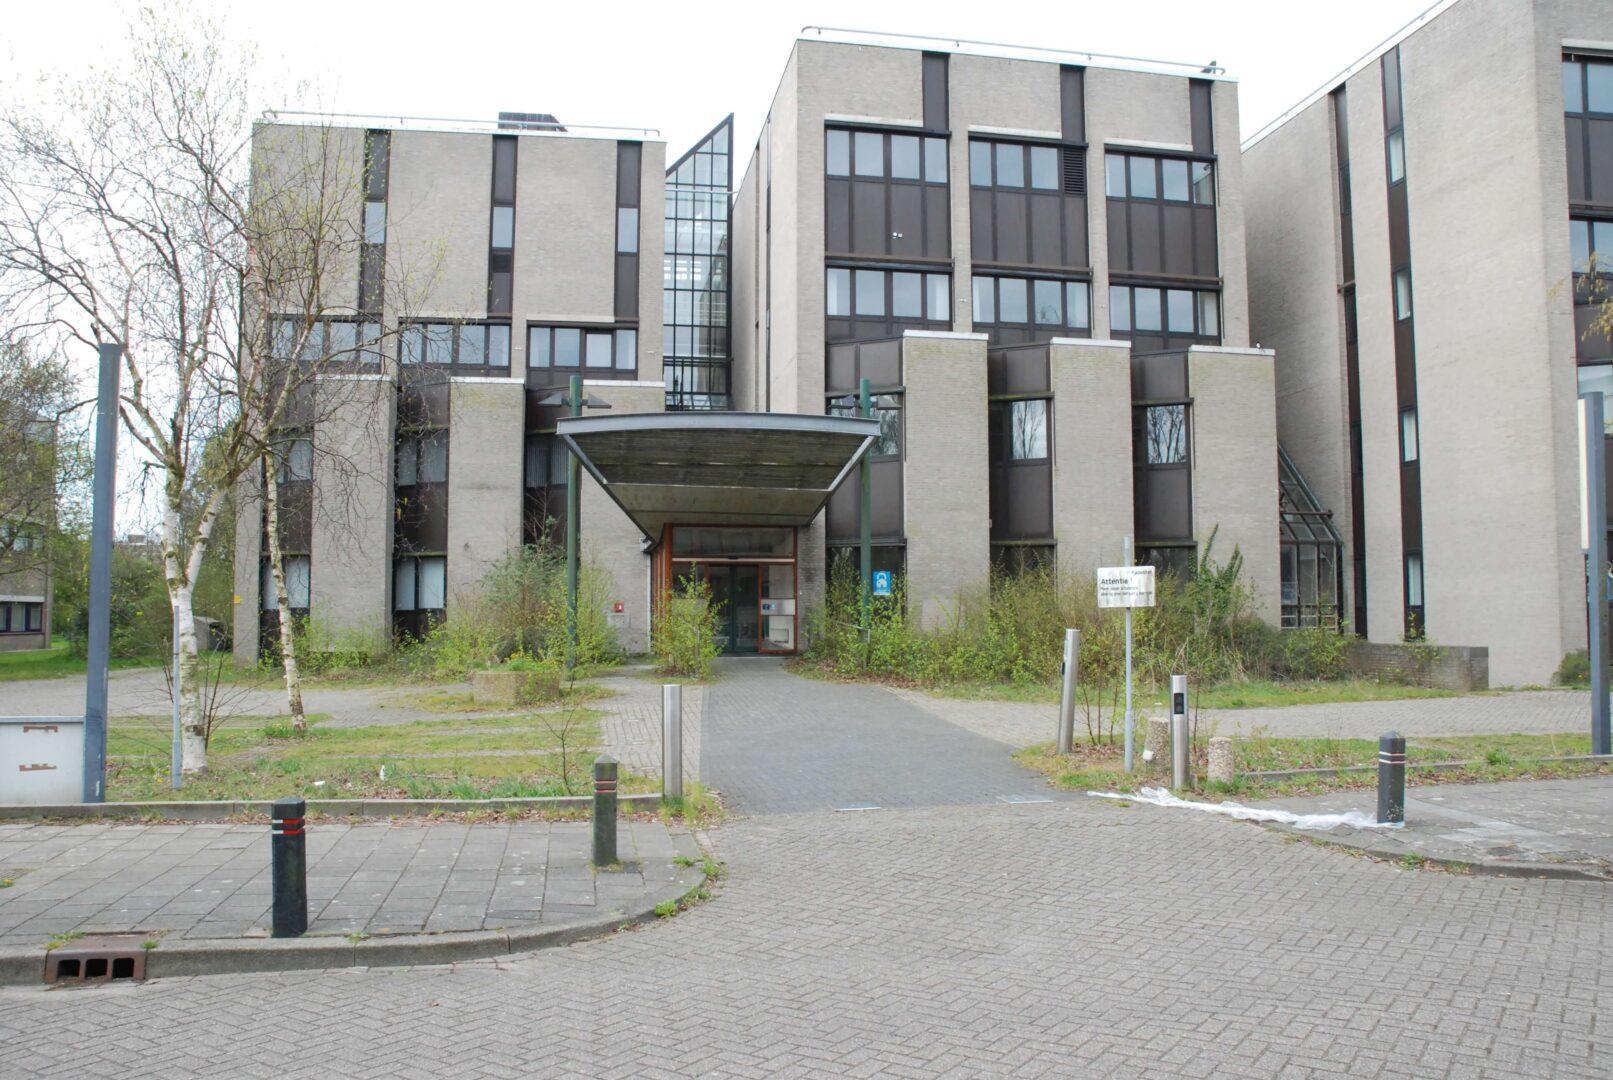 De-Landmeter-architect-Noord-Holland-Zijlstra-Schipper-vastgoed-transformatie-herbestemming-architectenbureau-wormer-oud-kantoorpand-01